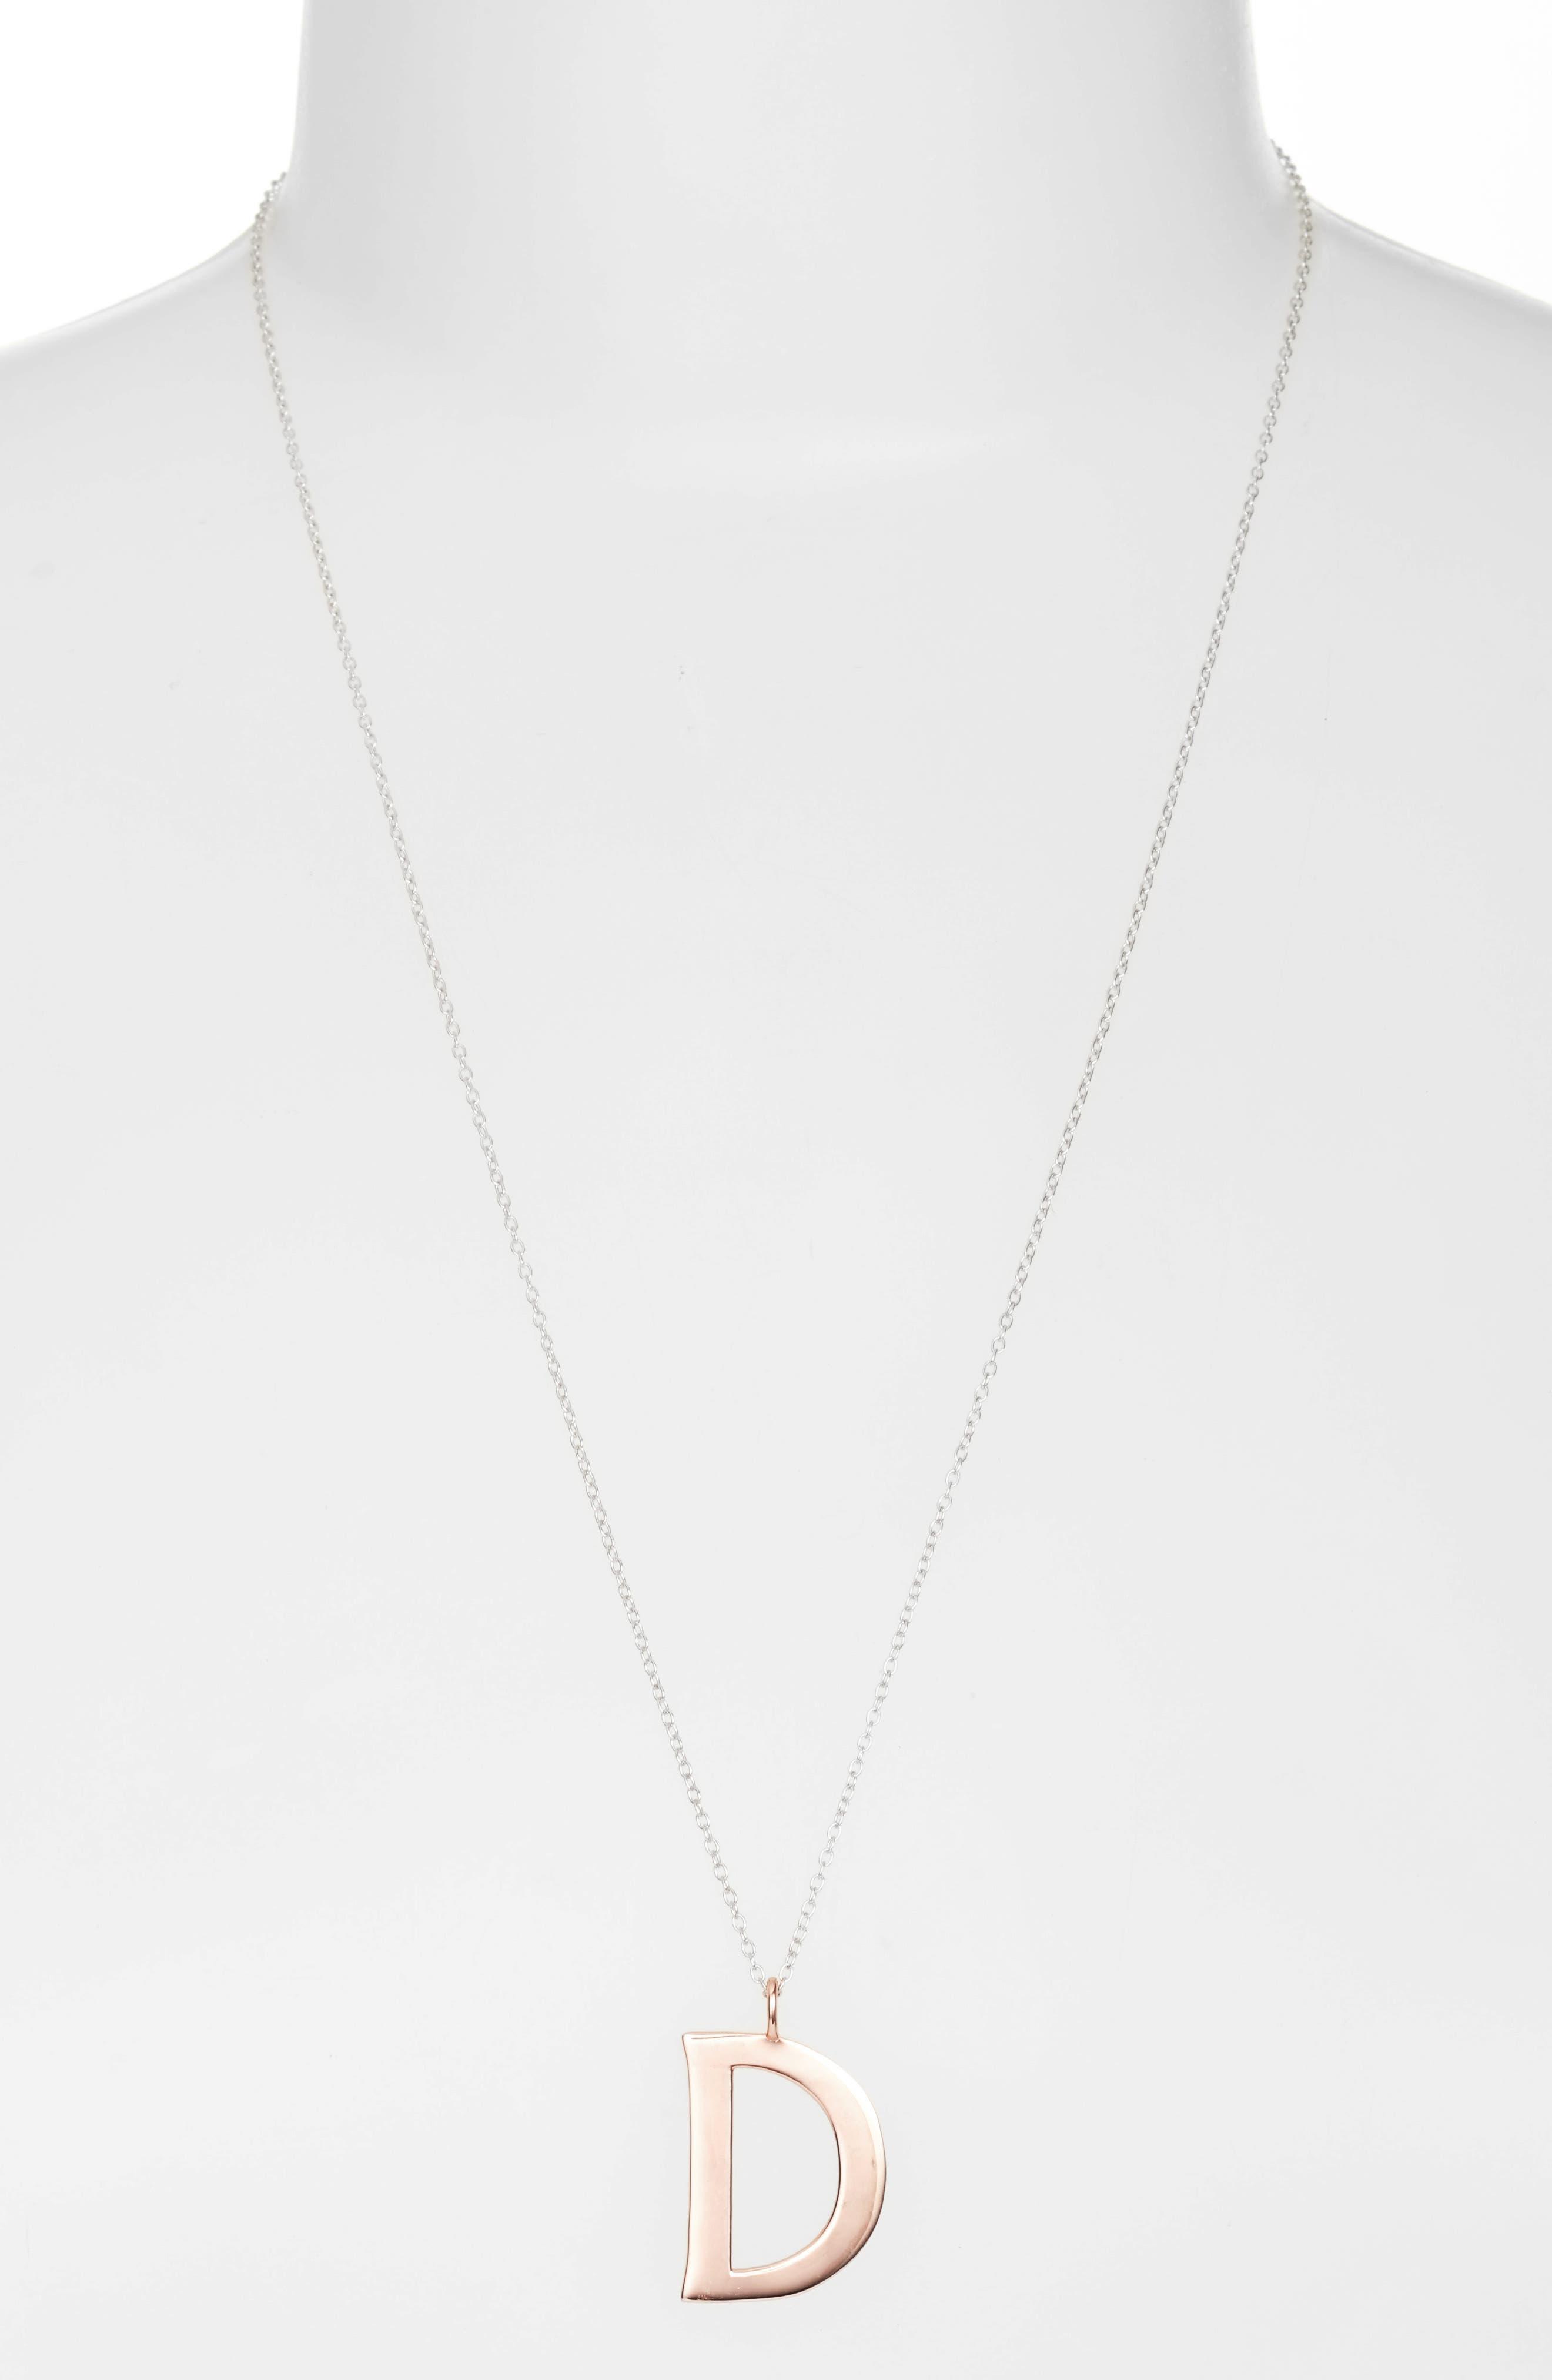 Initial Pendant Necklace,                         Main,                         color, ROSE GOLD / SILVER - D